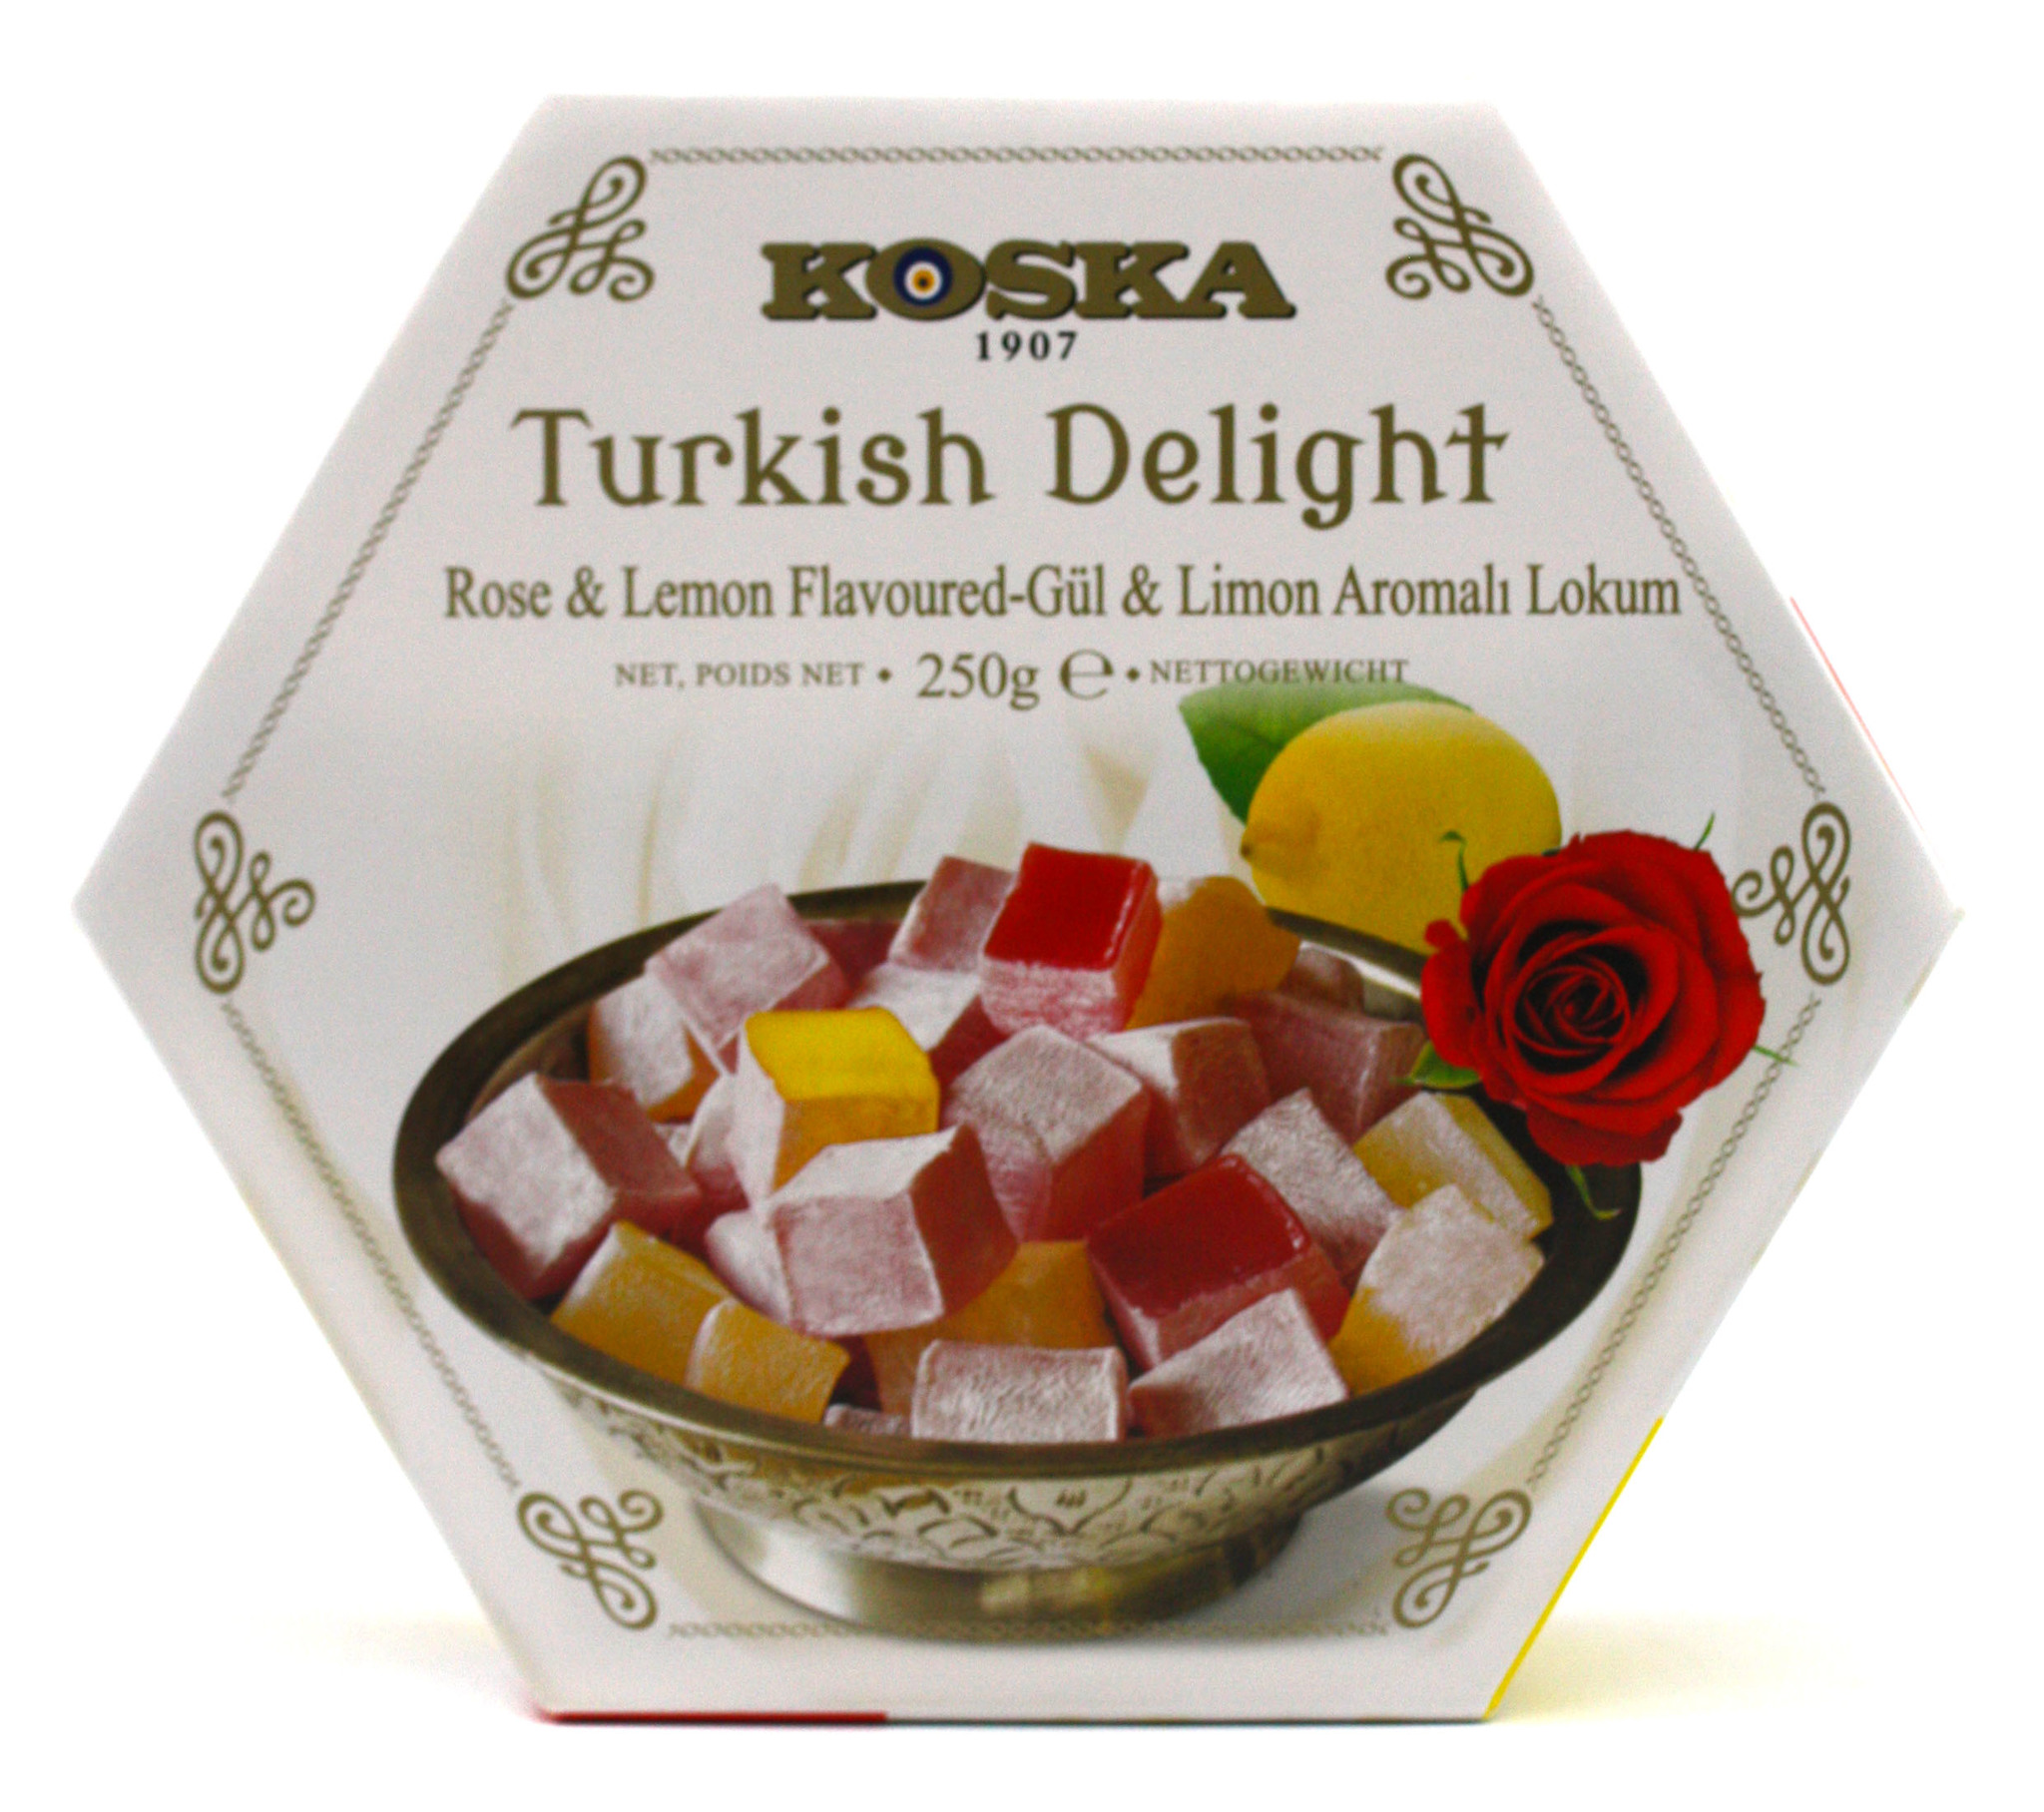 Koska Рахат-лукум со вкусом розы и лимона, Koska, 250 г import_files_1d_1da23c5cbdb311e9a9b1484d7ecee297_1da23c61bdb311e9a9b1484d7ecee297.jpg